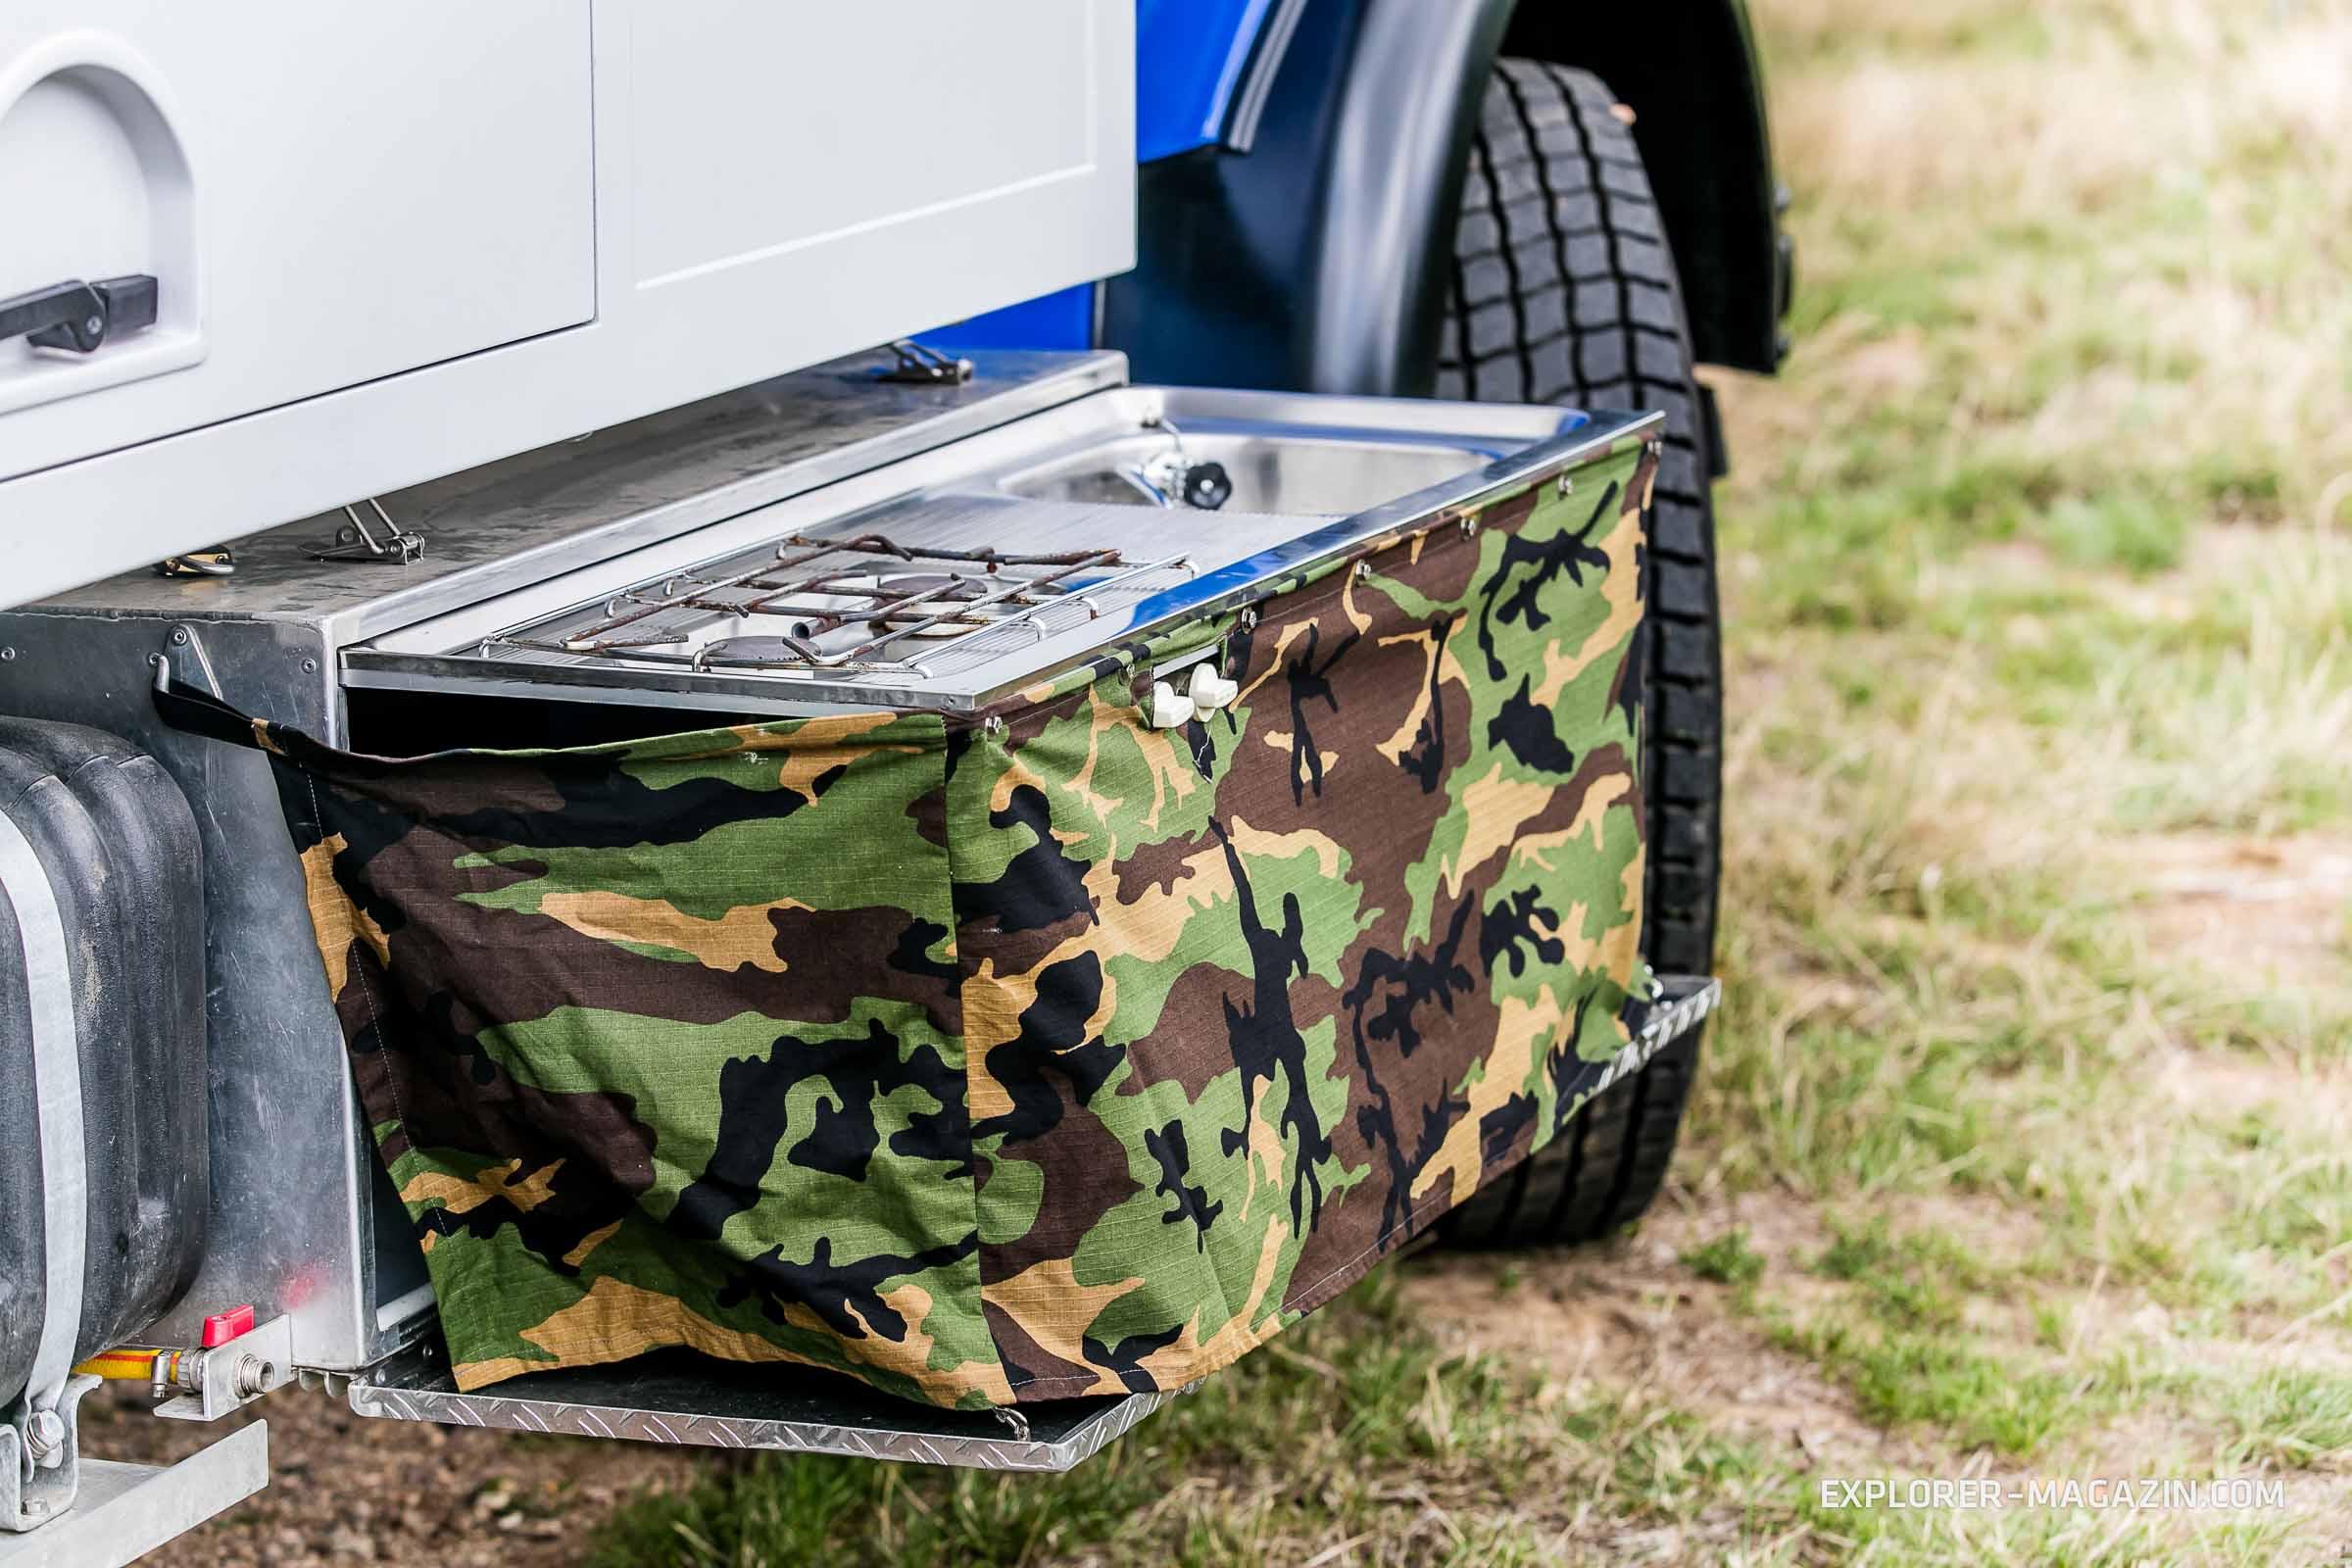 Daimler Benz LA 911 Kurzhauber